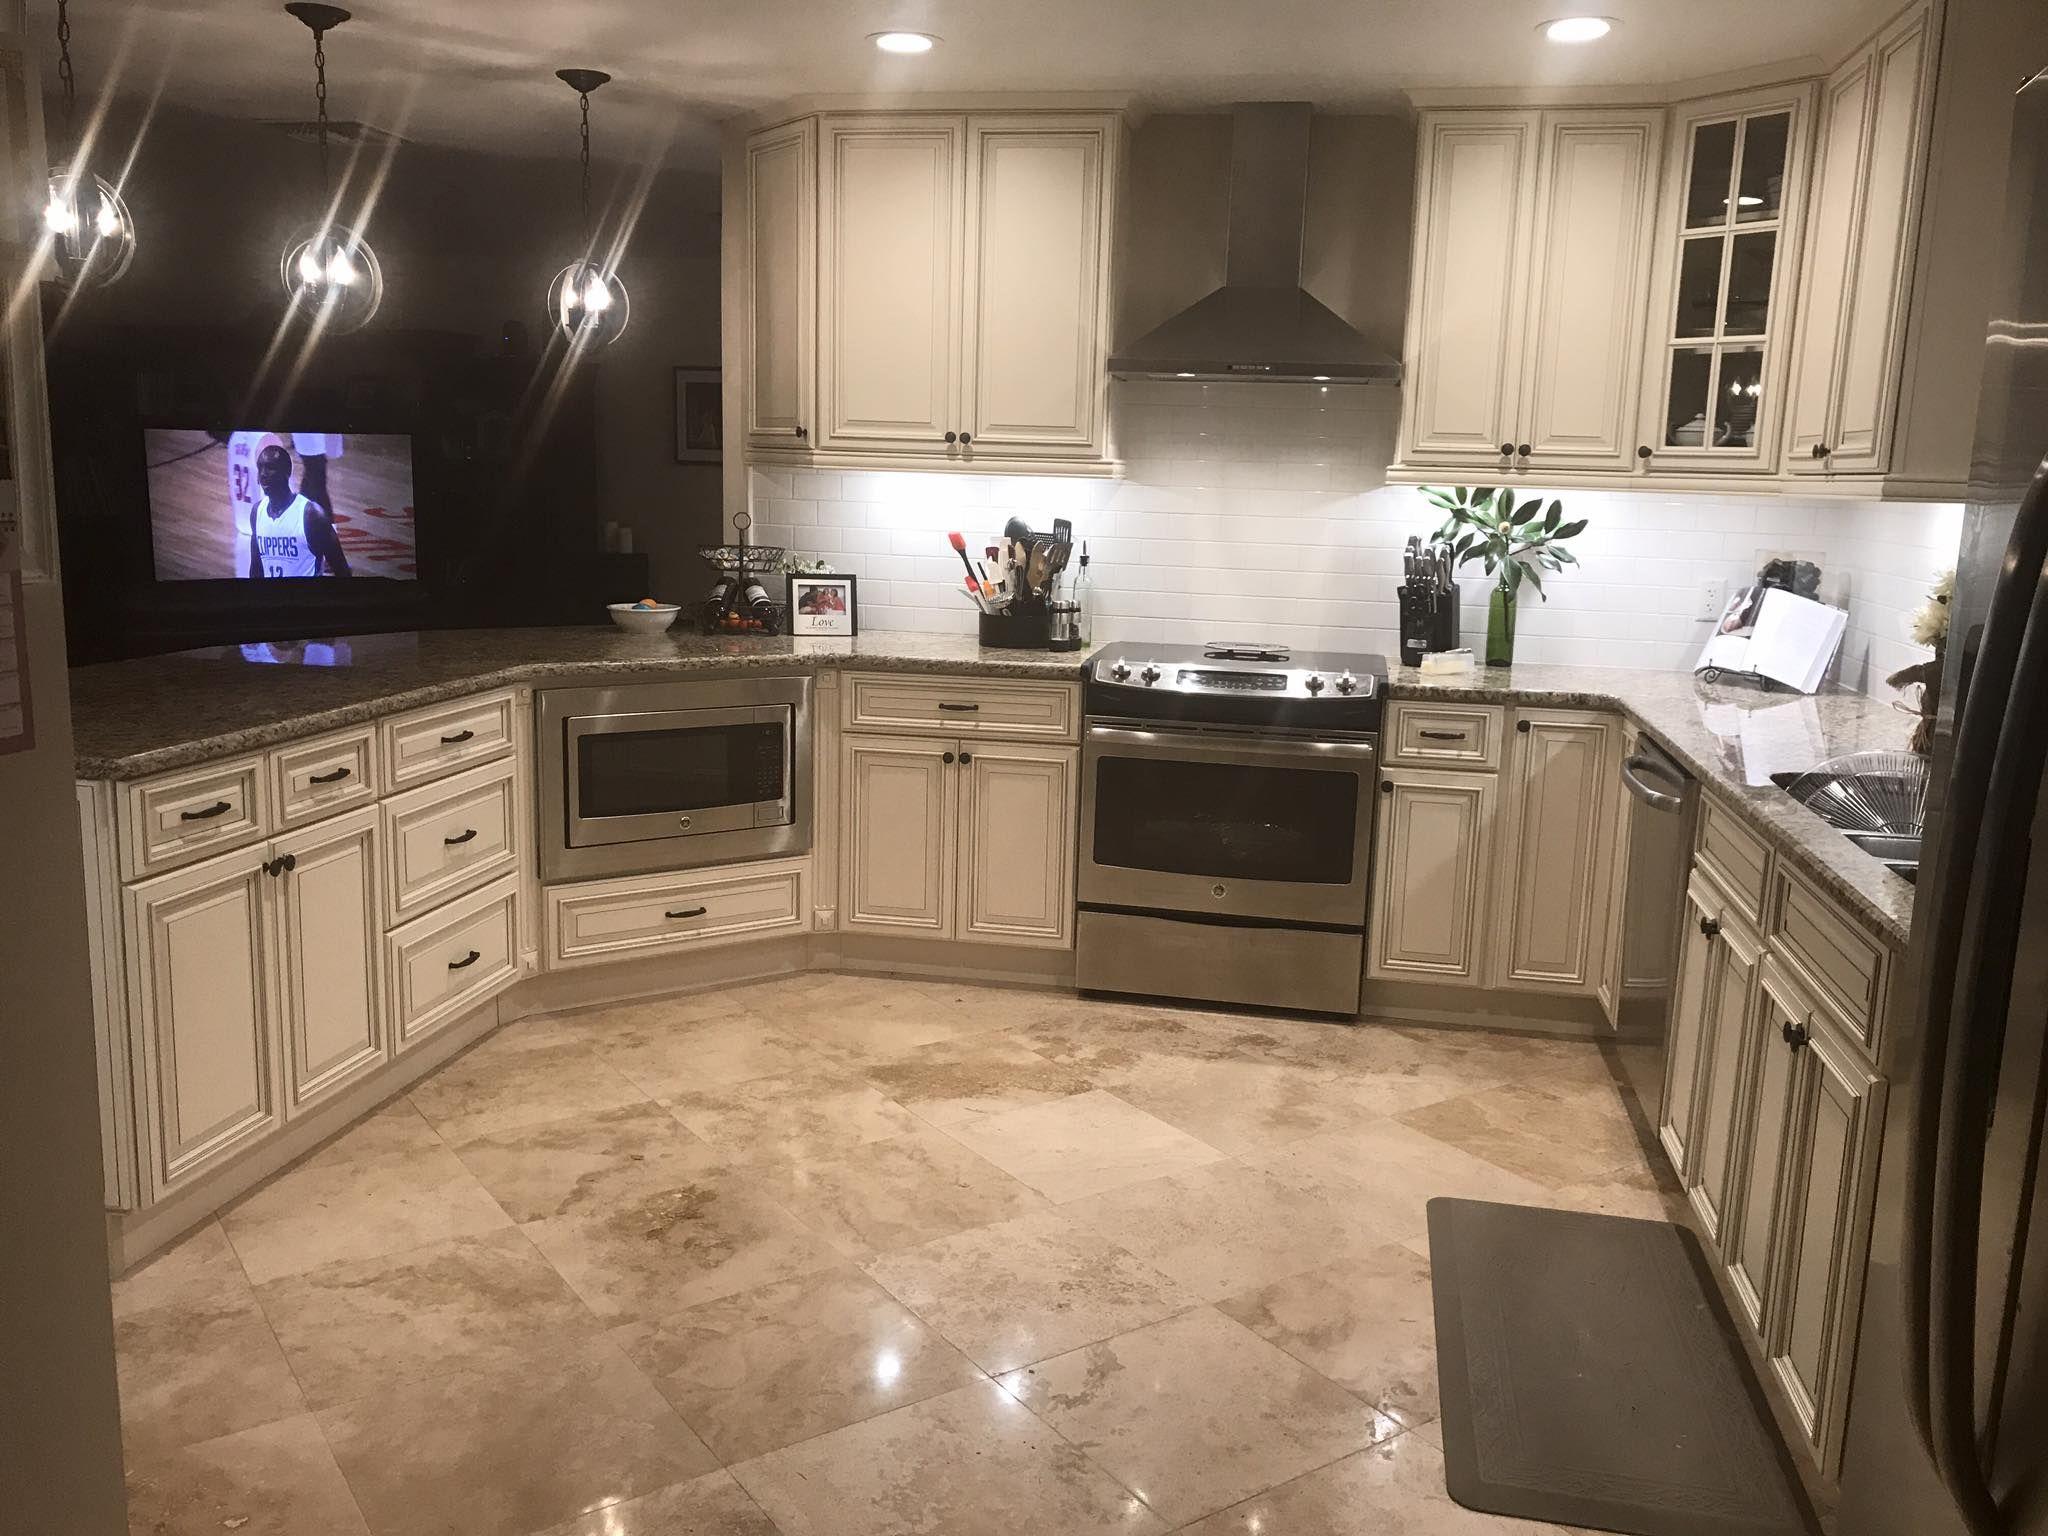 Signature Pearl Kitchen Cabinets Kitchen Cabinets Quality Kitchen Cabinets Kitchen